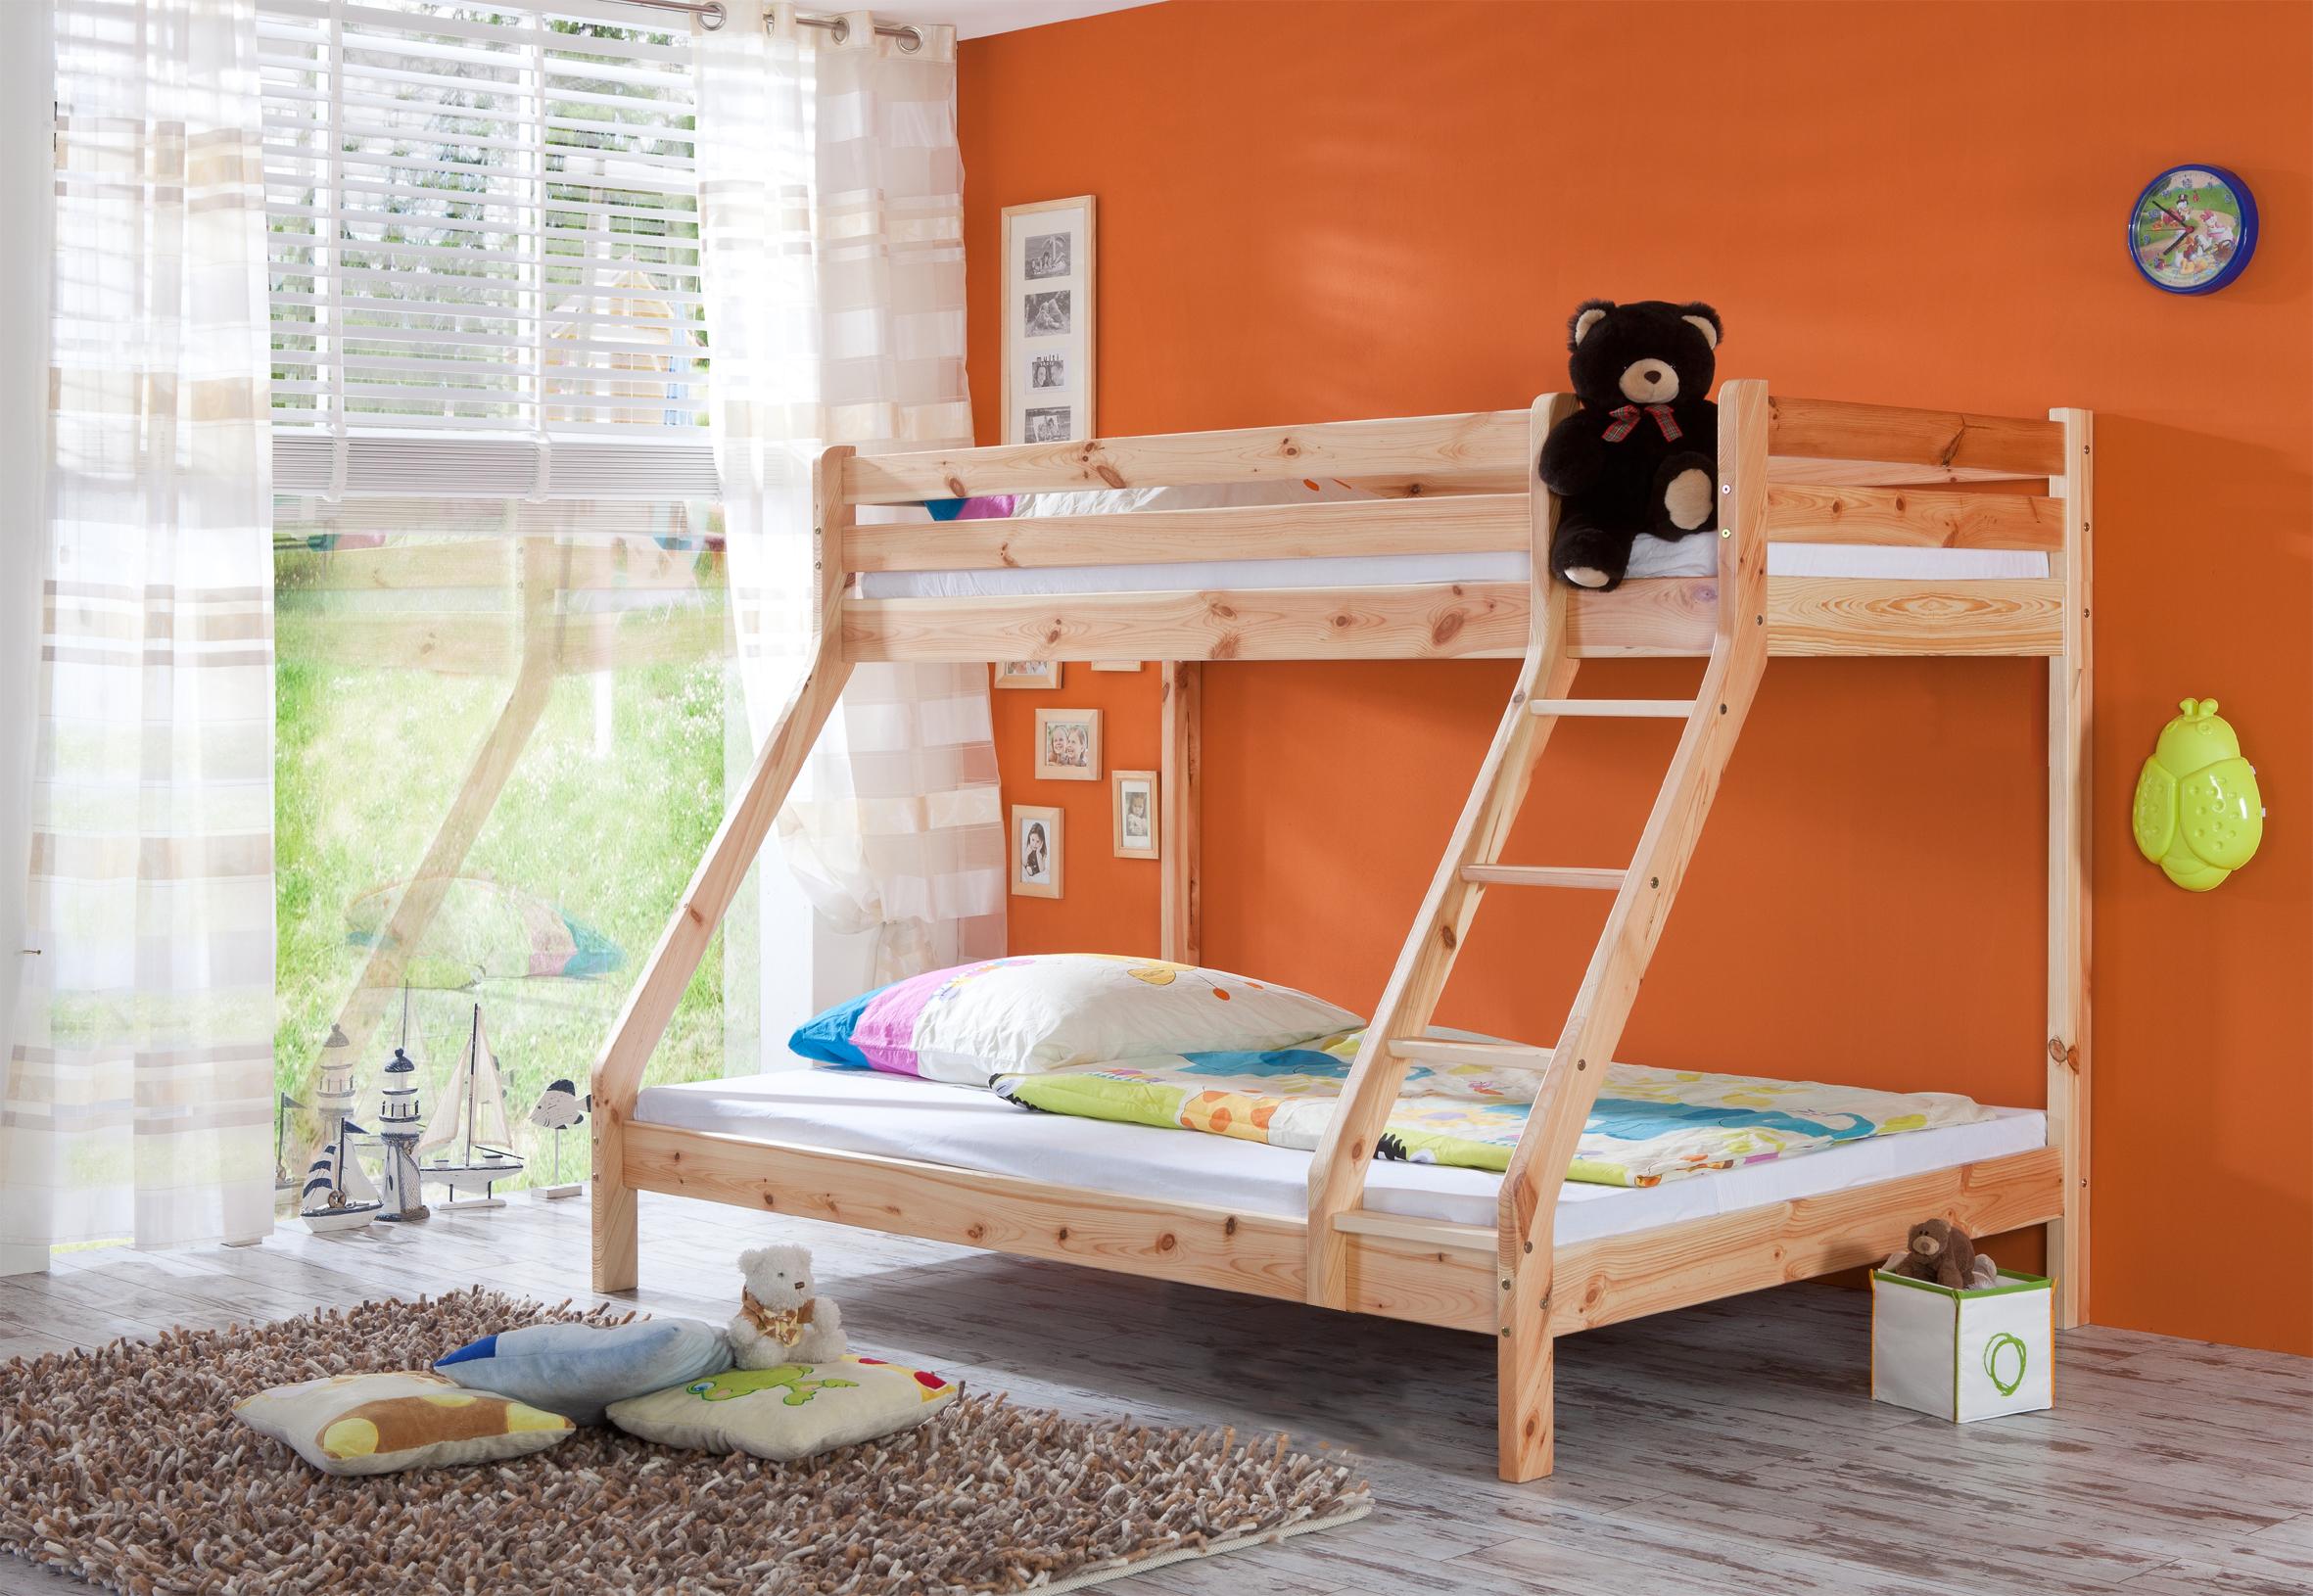 Etagenbett Eiche Massiv : Hochbett etagenbett stockbett kinderbett kinderzimmer rollrost